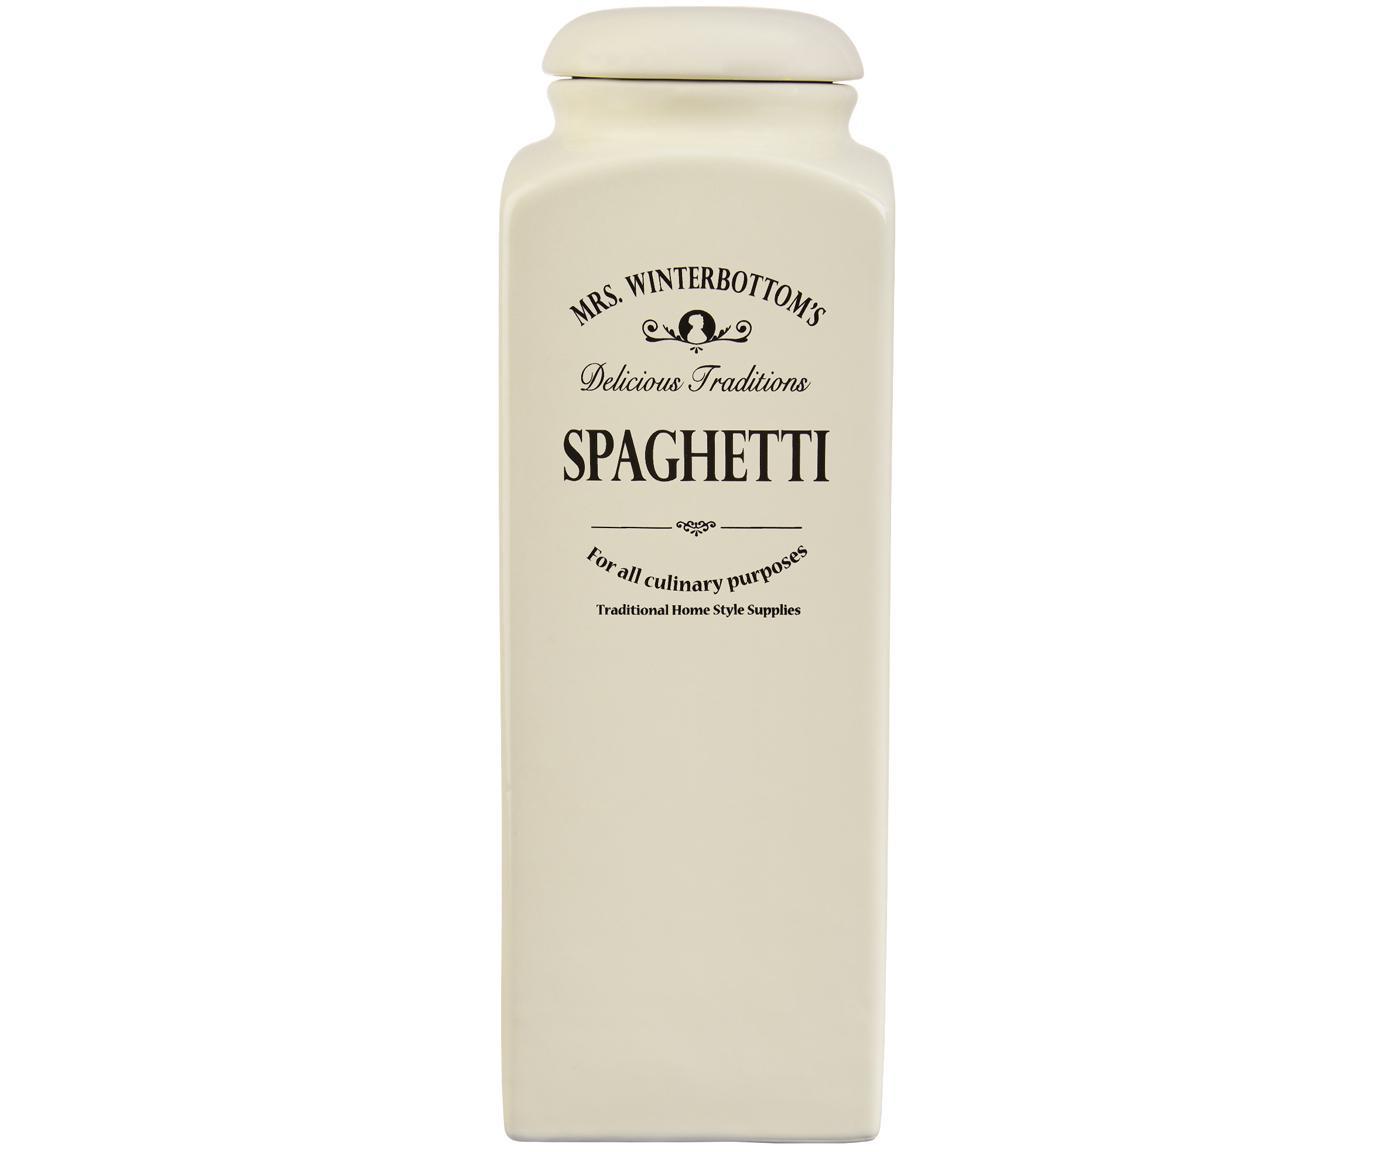 Opbergpot Mrs Winterbottoms Spaghetti, Keramiek, Crèmekleurig, zwart, 12 x 32 cm